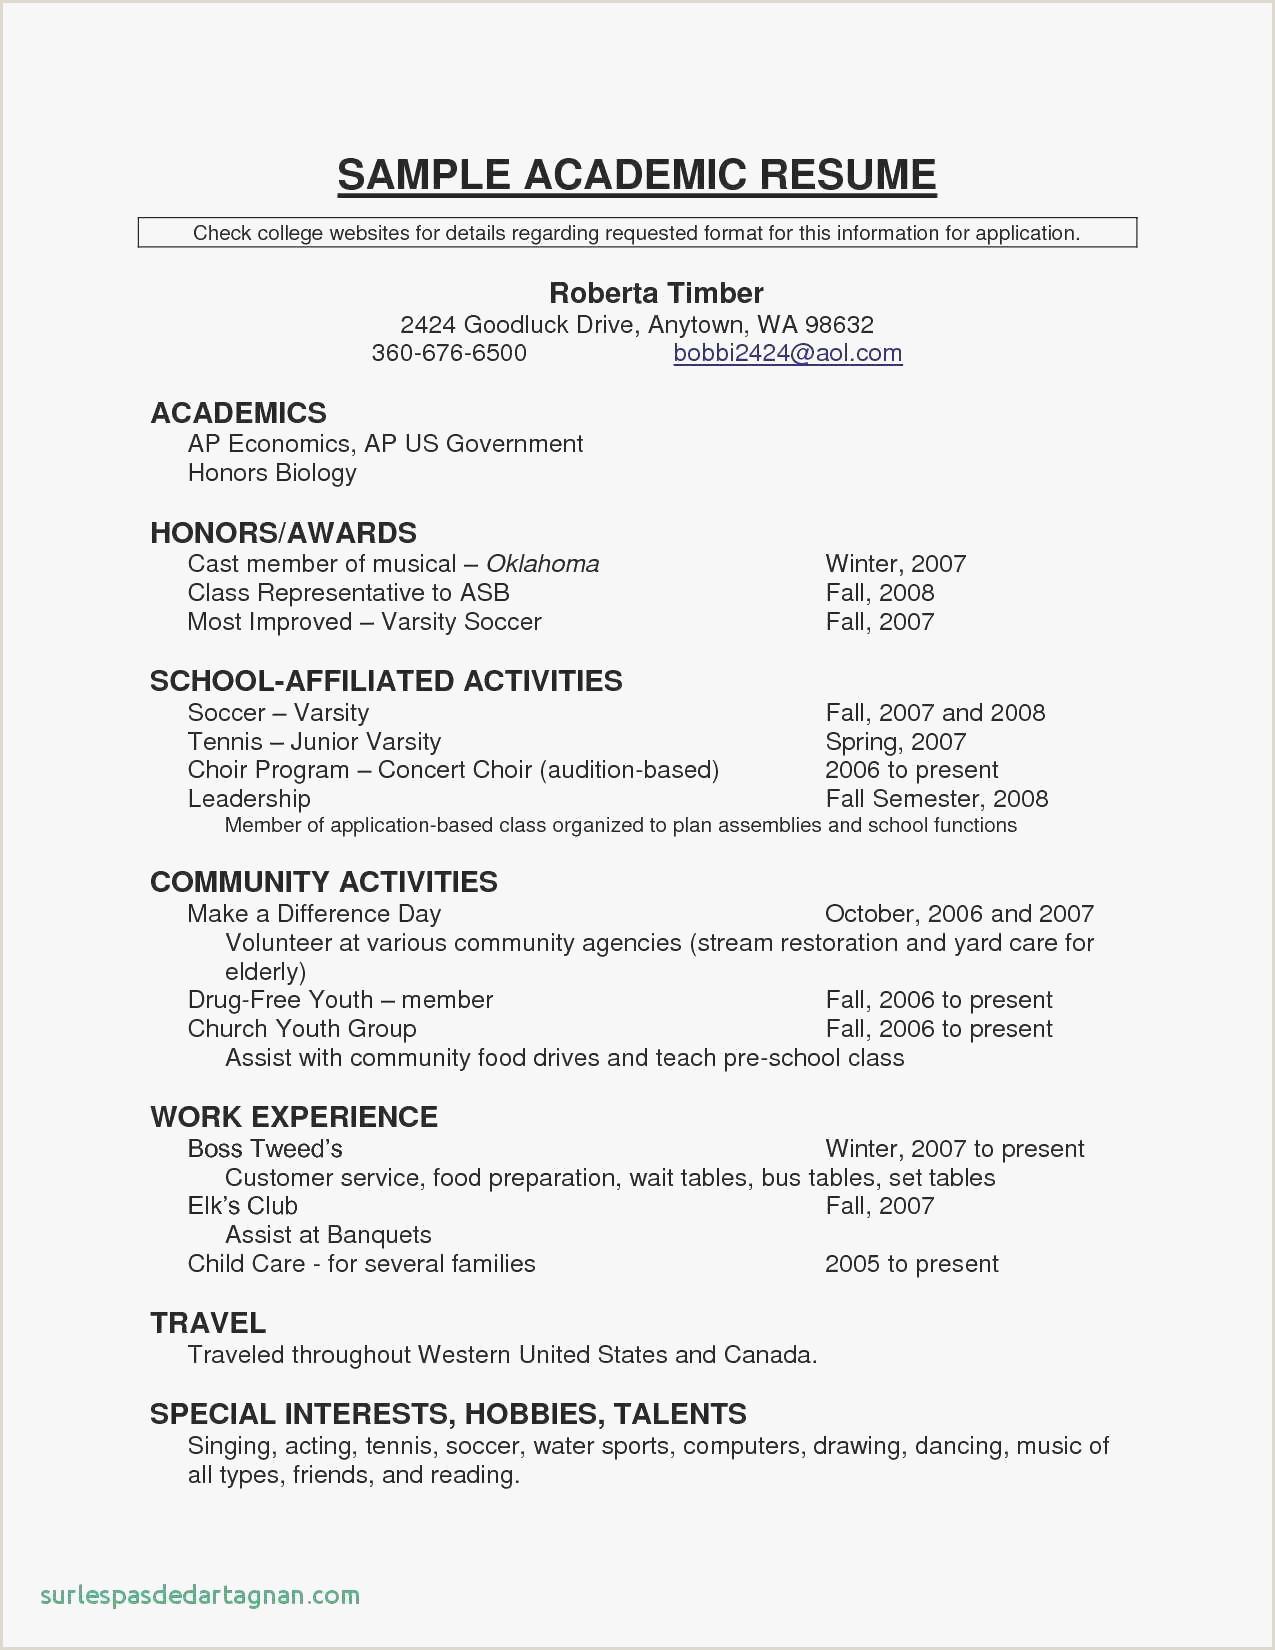 Cover Letter for Financial Advisor Inspirational Financial Consultant Resume